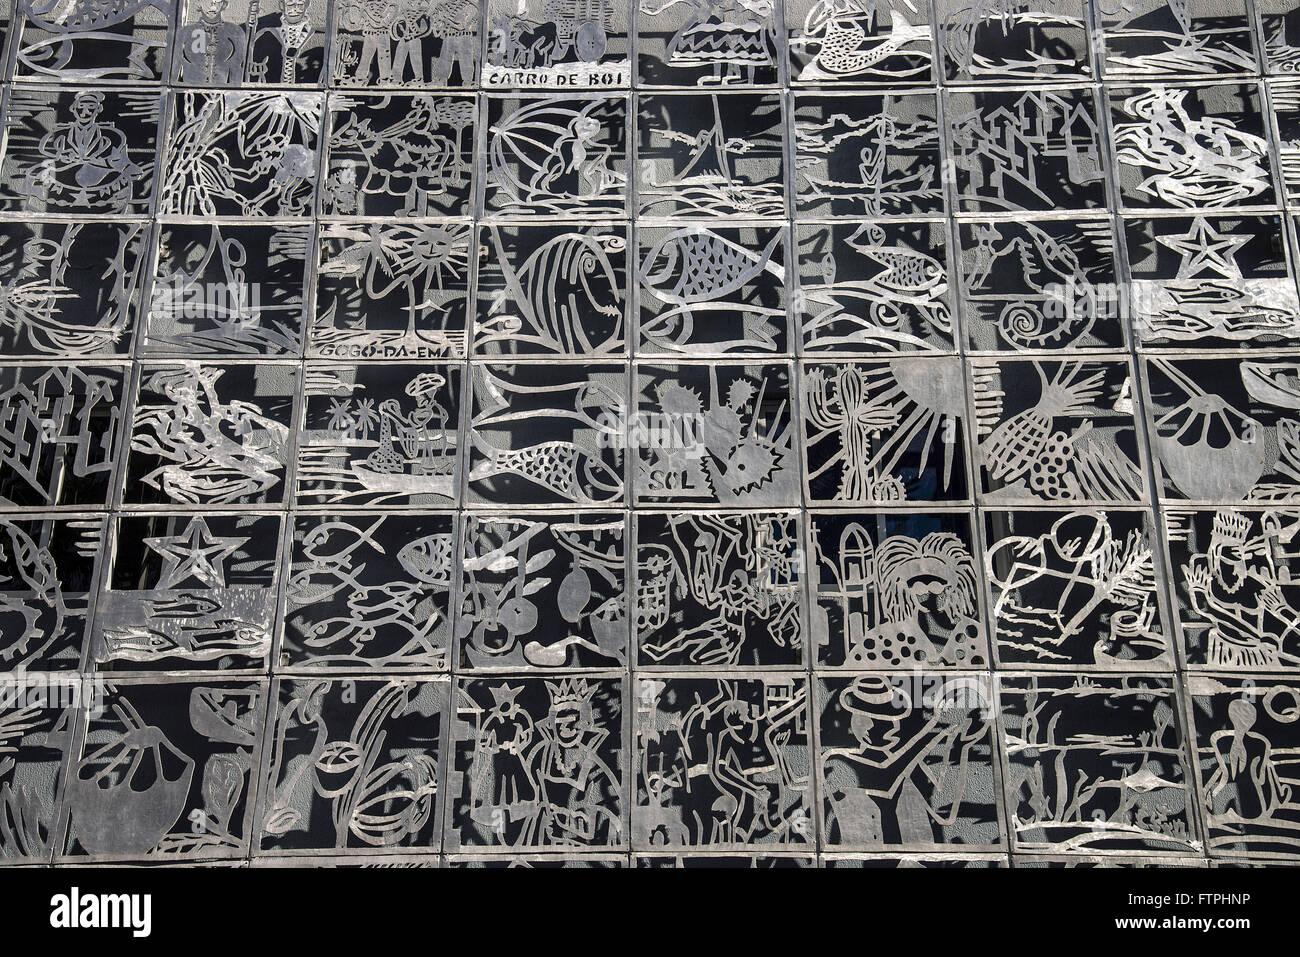 Panel-Detail mit repräsentativen Bildern der Populärkultur Alagoas Stockbild